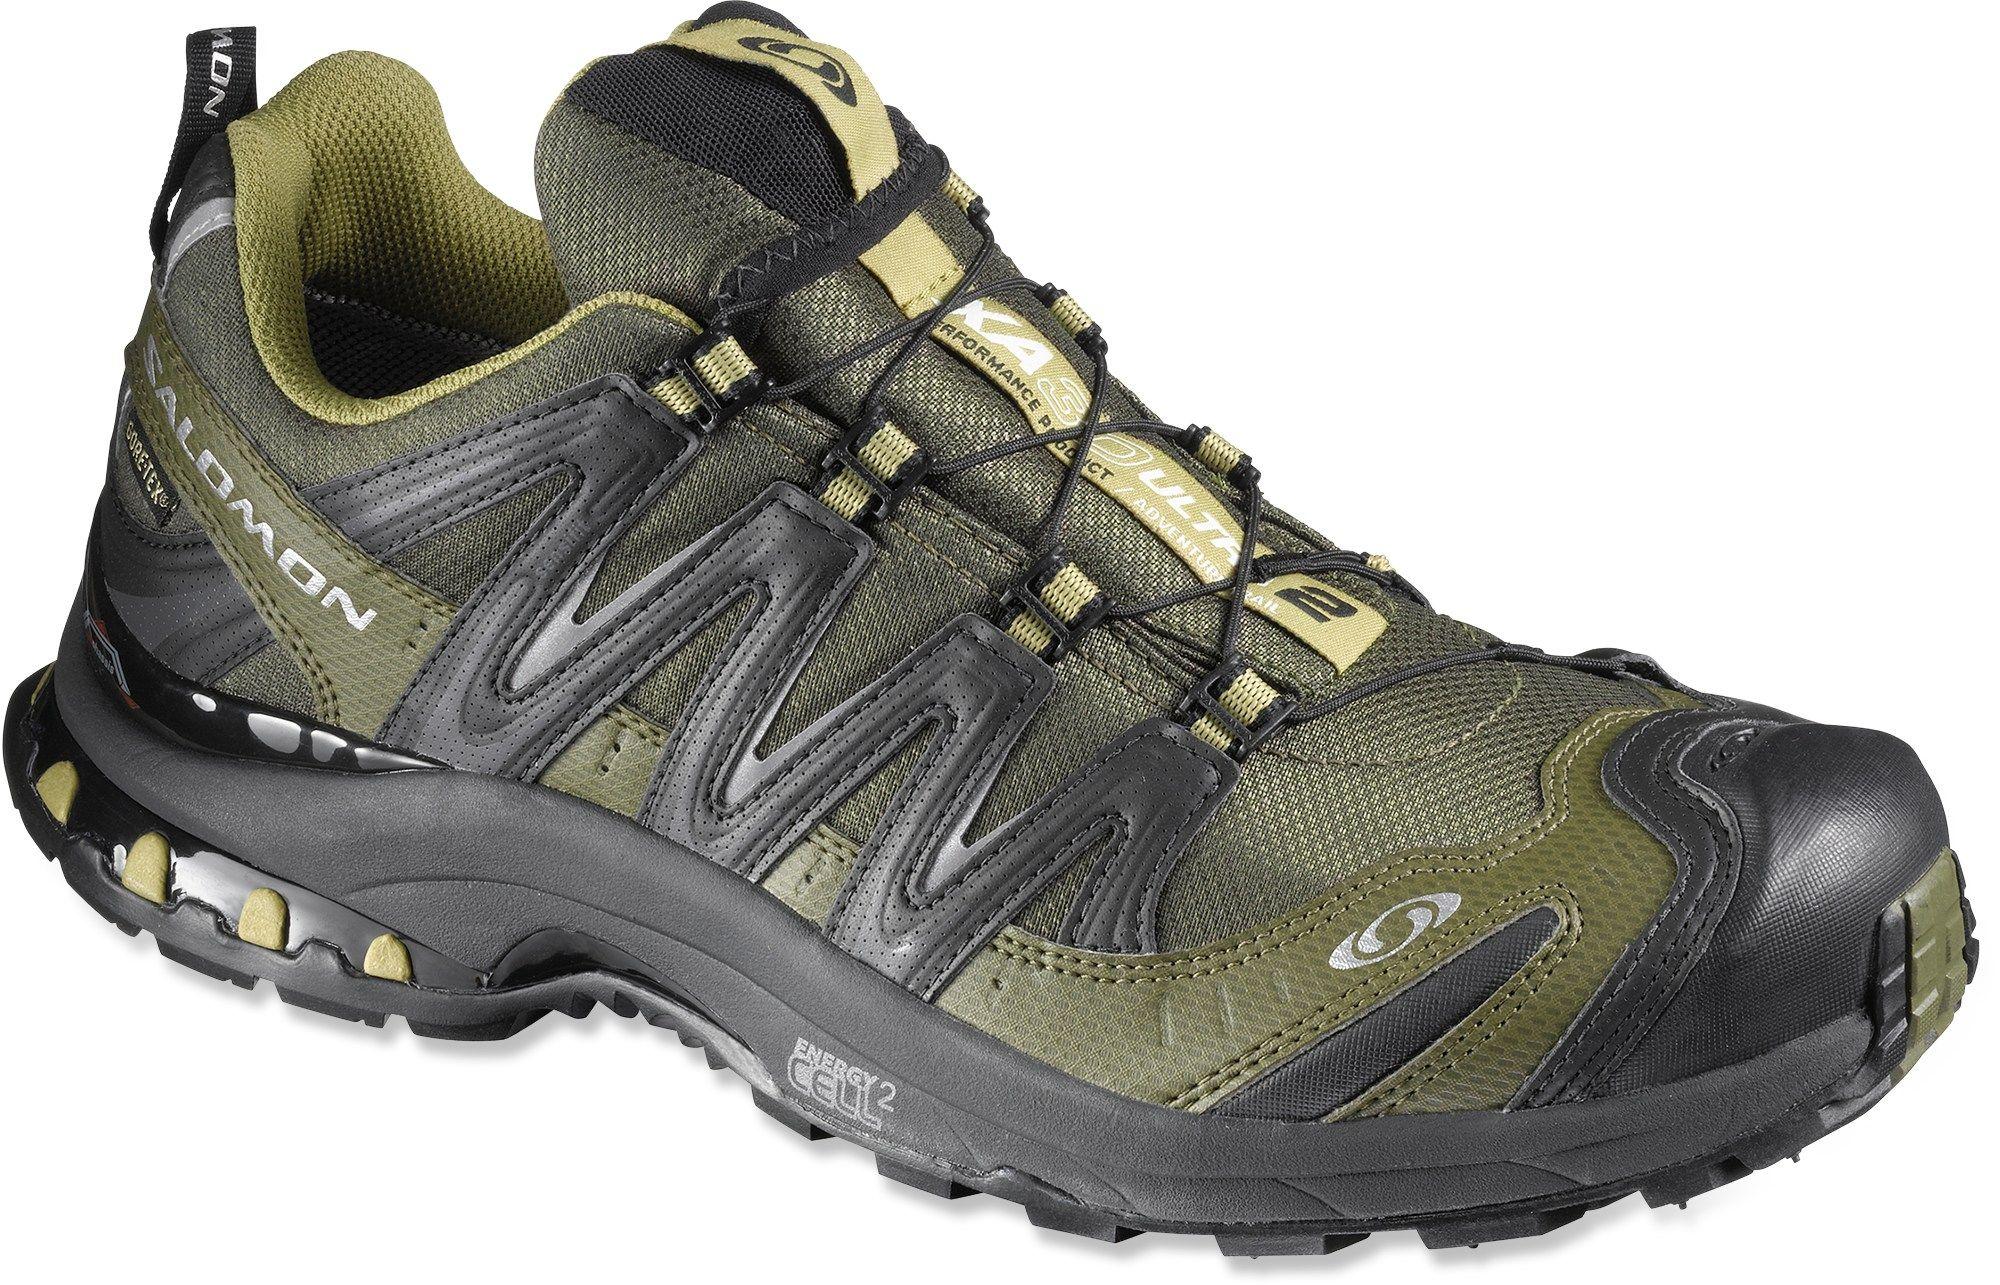 Salomon Xa Pro 3d Ultra 2 Gtx Trail Running Shoes Men S Rei Co Op Hiking Fashion Mens Trail Running Shoes Best Trail Running Shoes